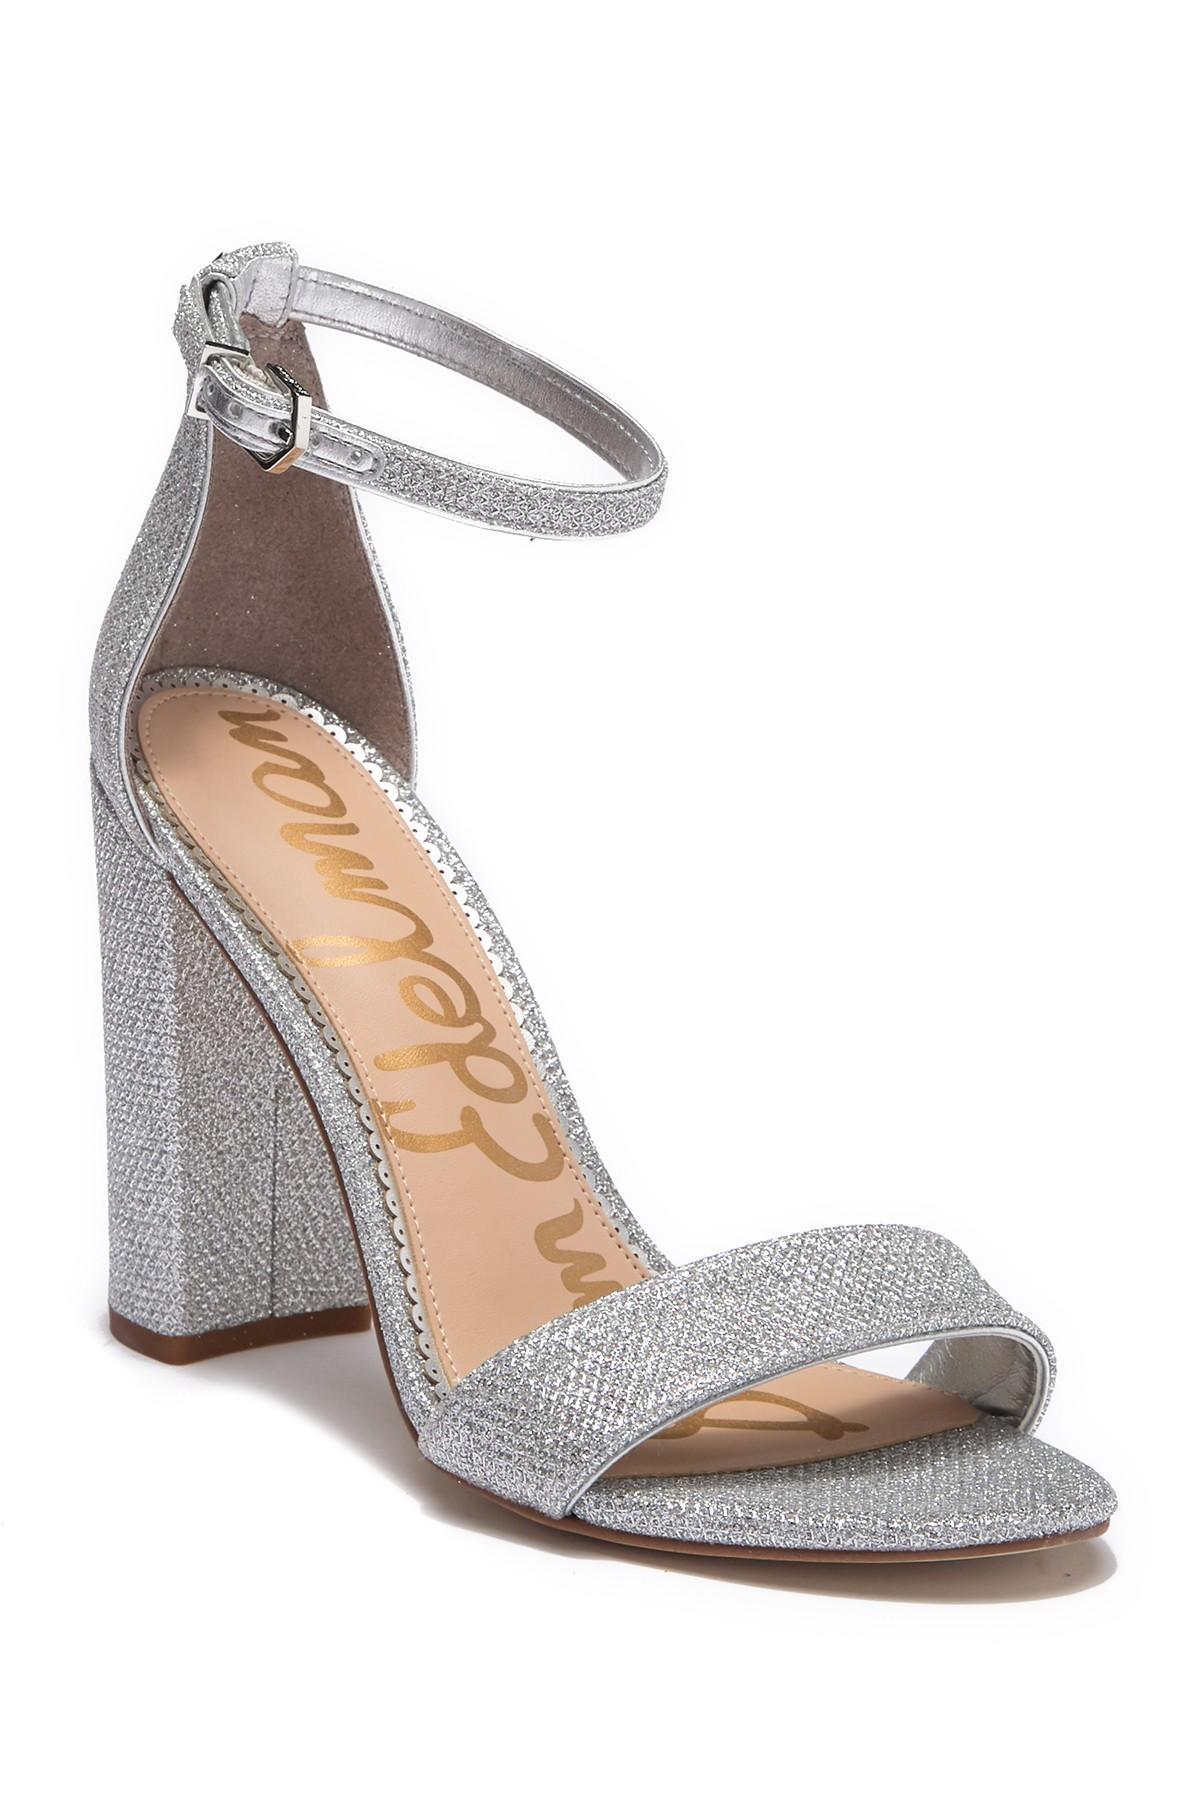 a42b45084 Lyst - Sam Edelman Yaro Ankle Strap Sandal (women) in Metallic ...